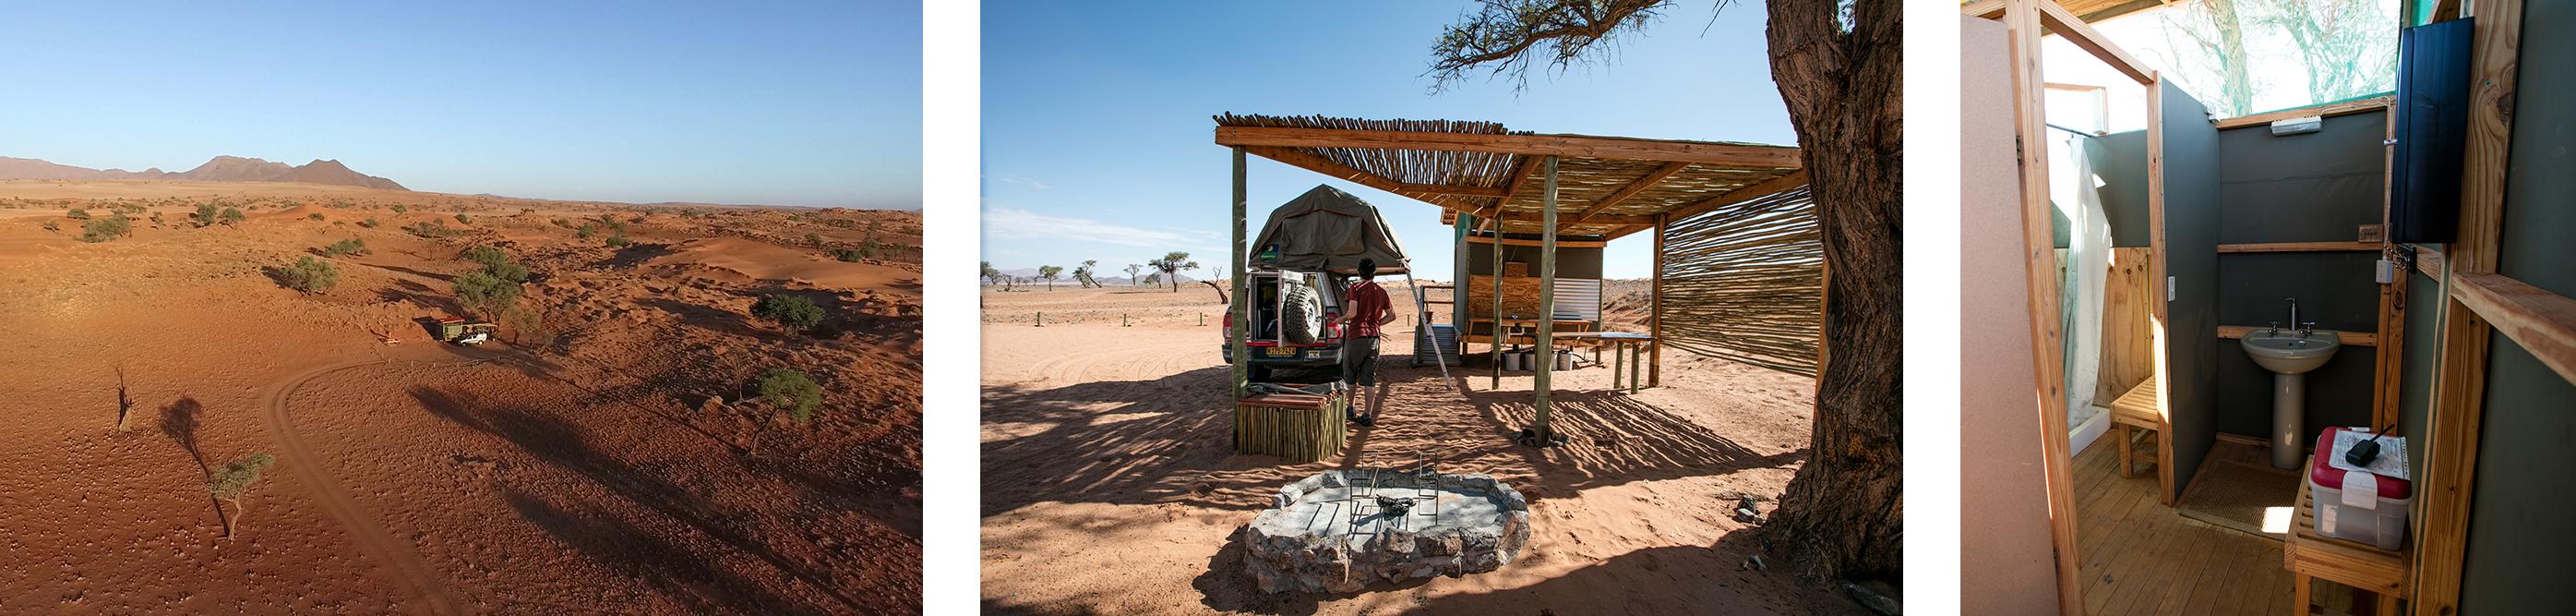 campsite-namibie-namibrand